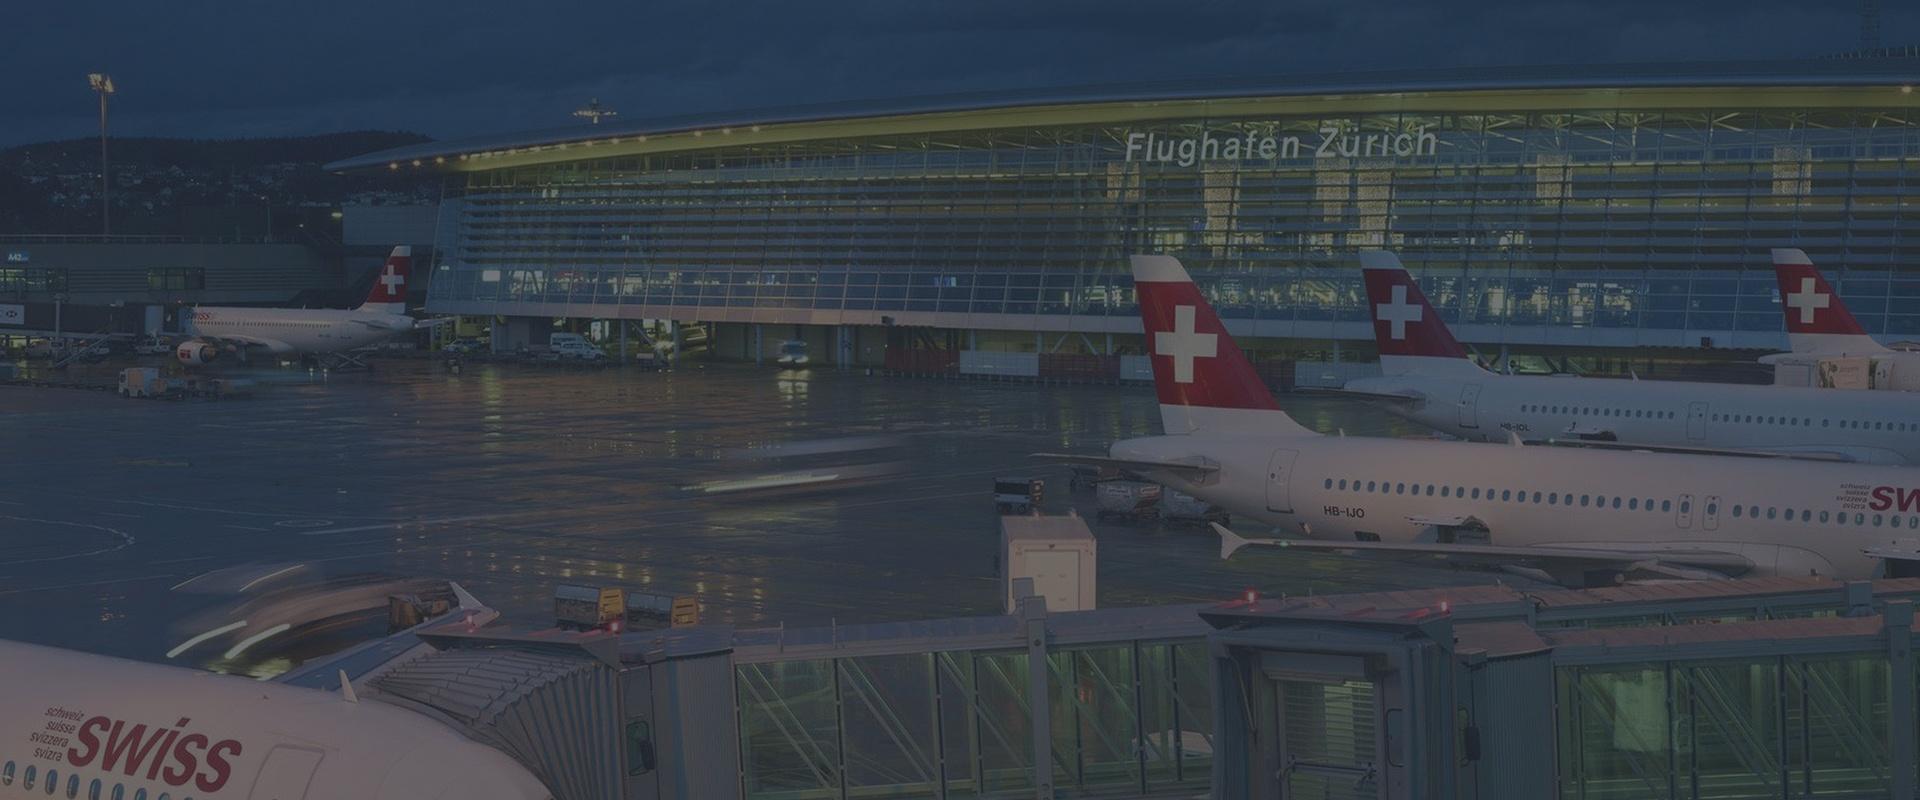 zurich-airport-success-story